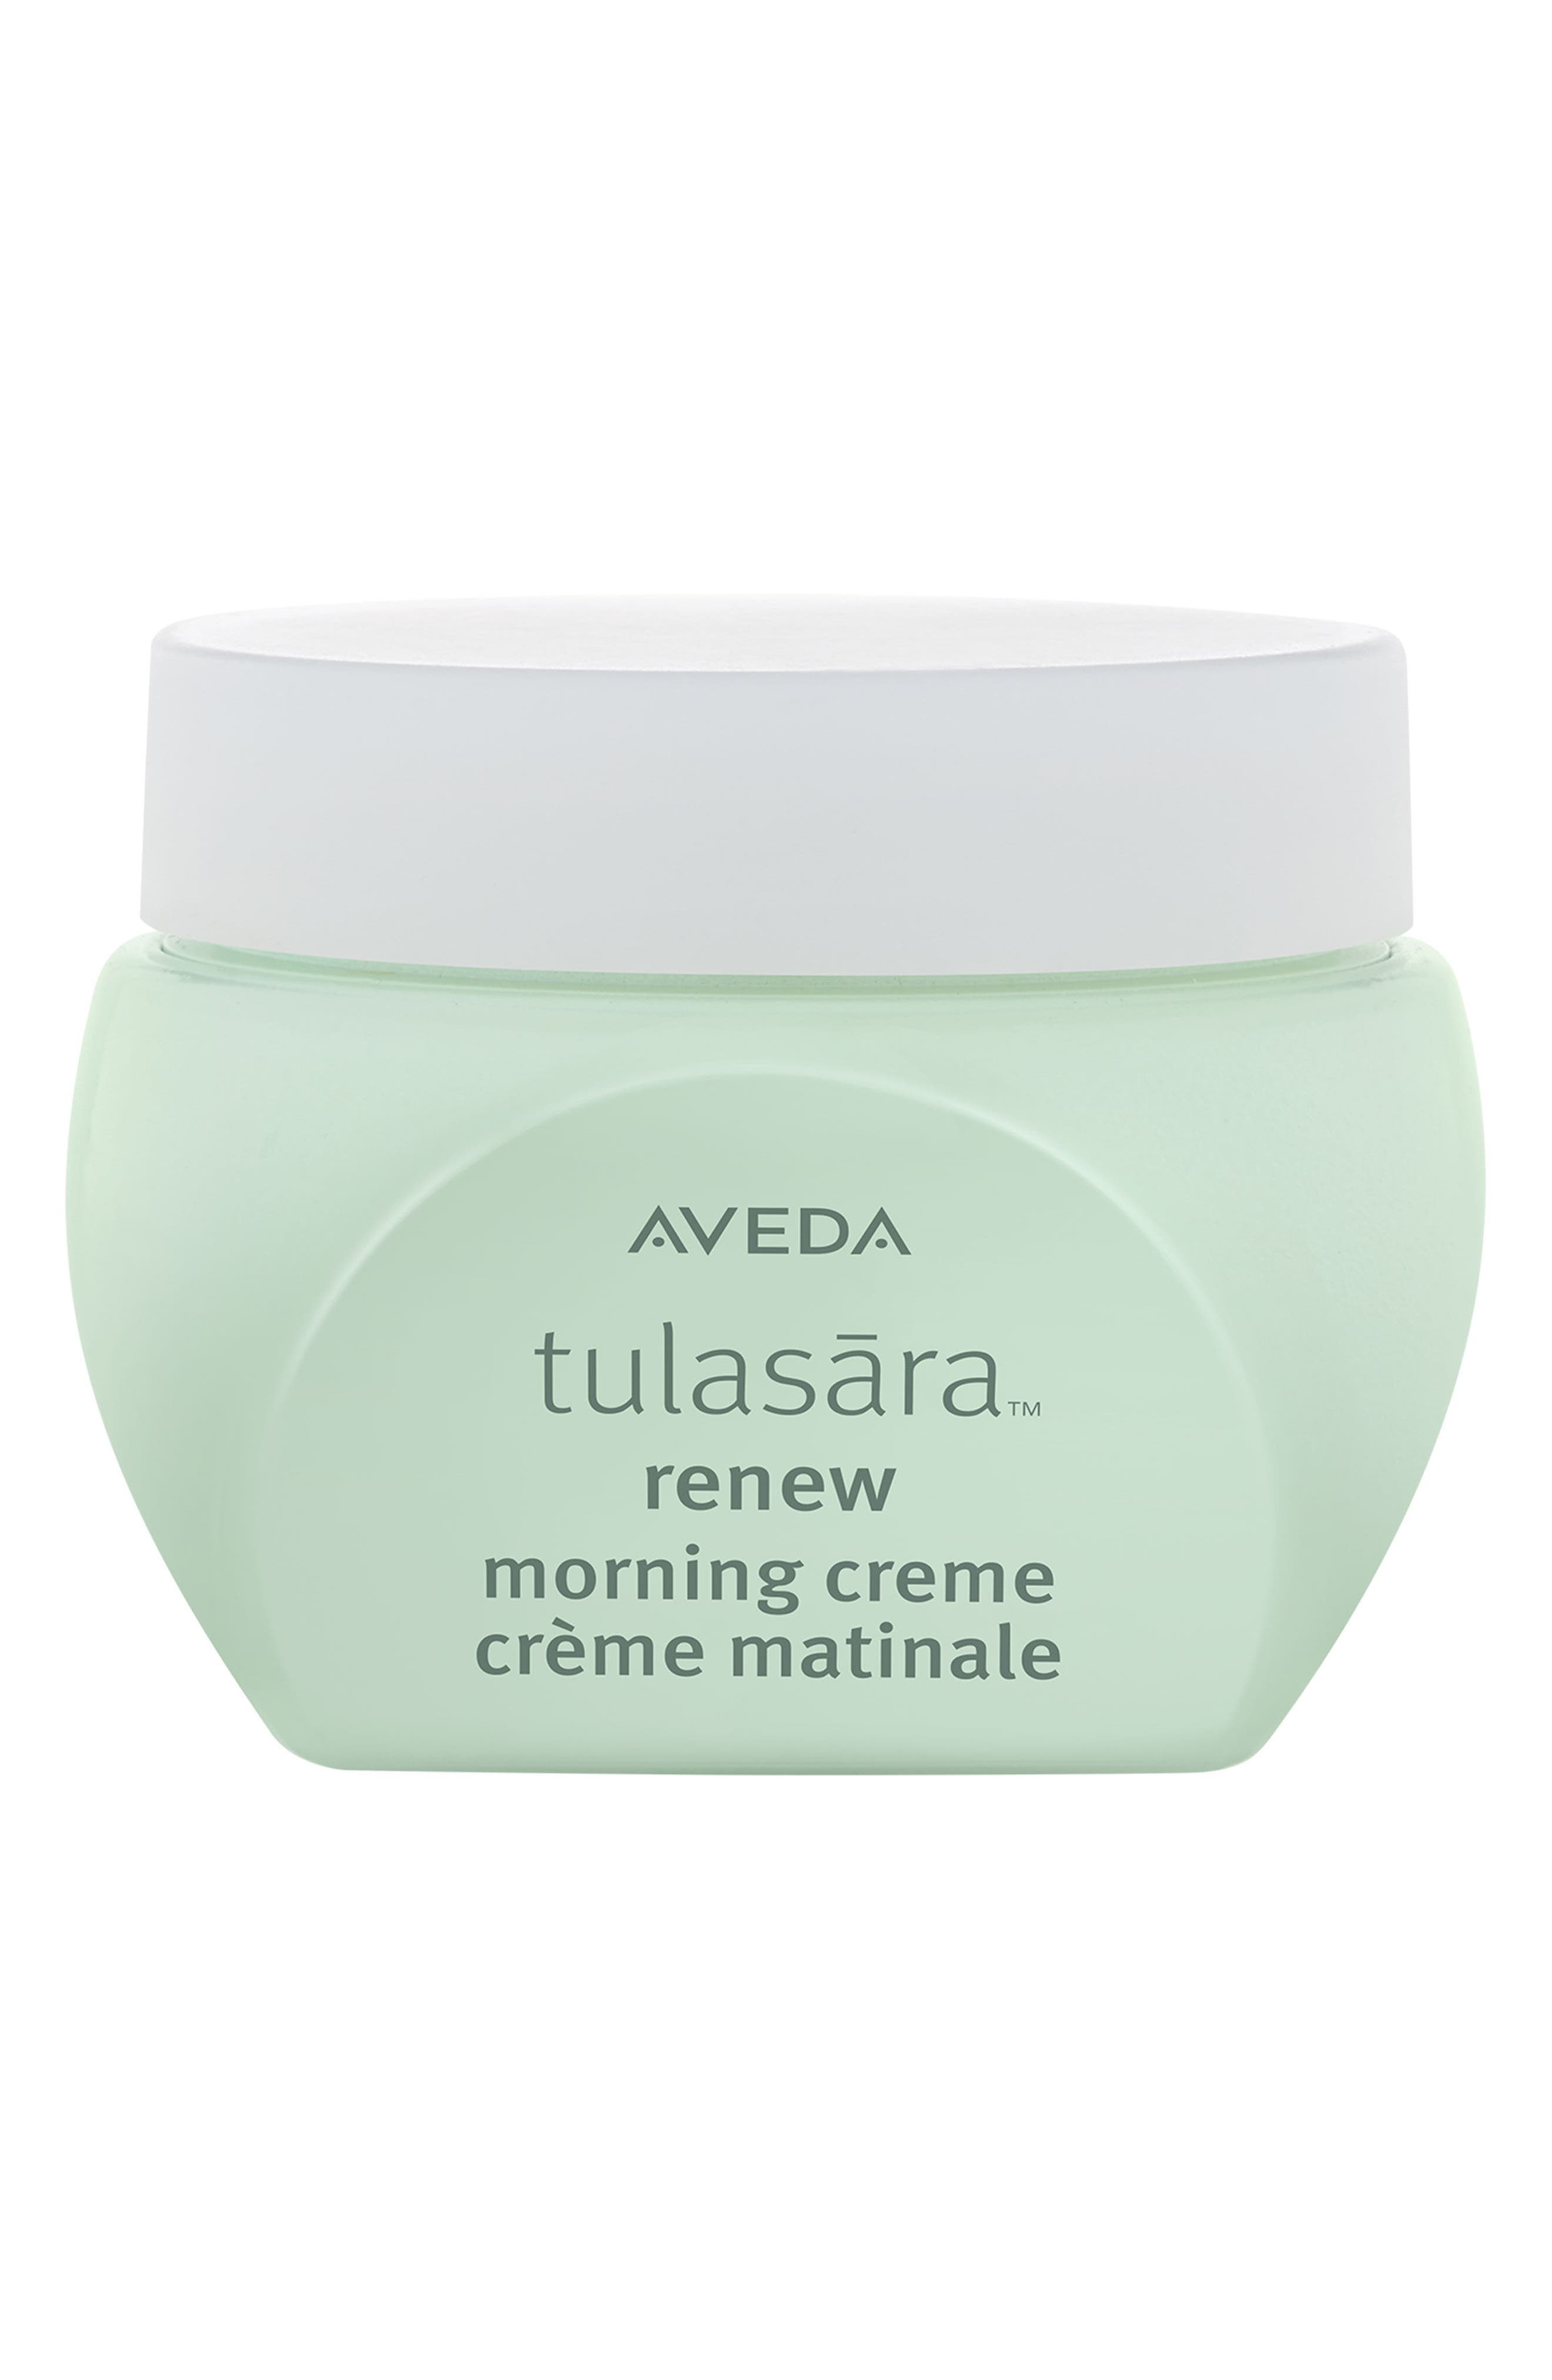 Alternate Image 1 Selected - Aveda tulasara™ renew Morning Crème